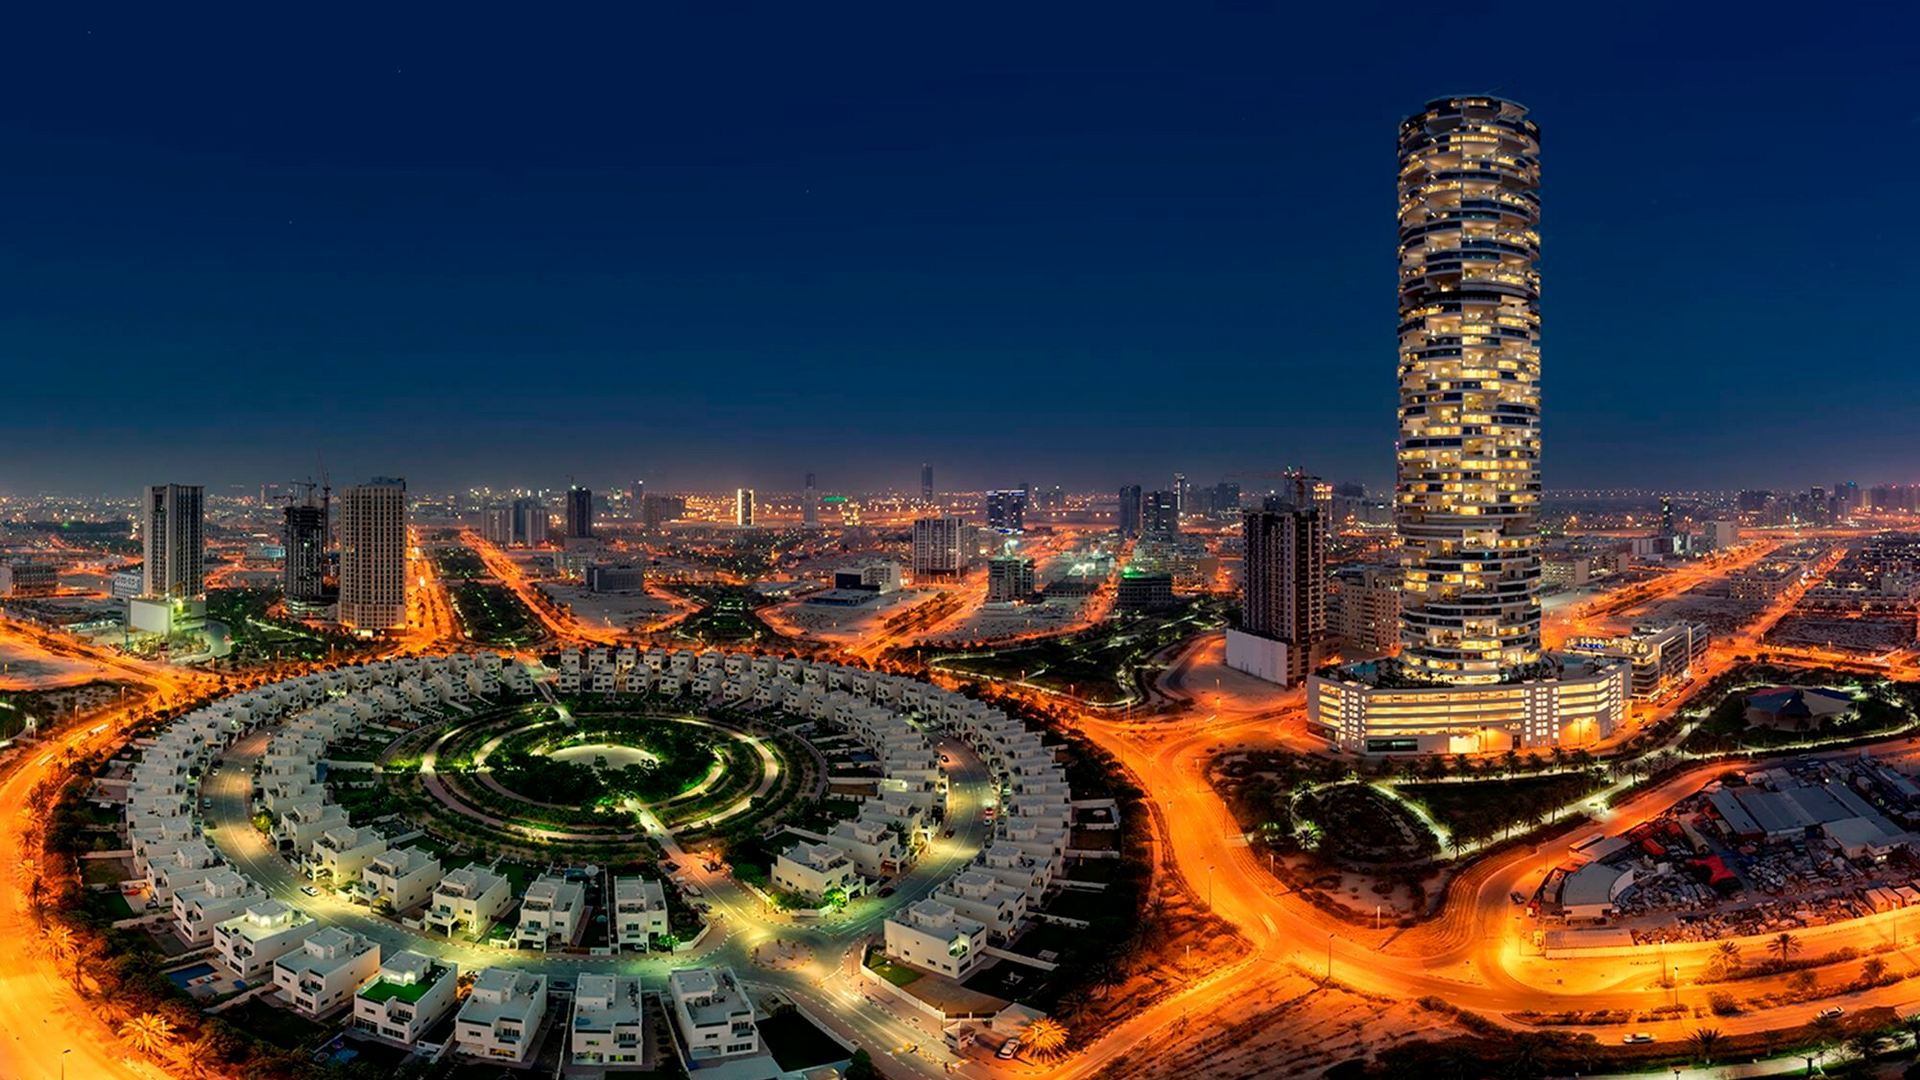 Jumeirah Village Circle (JVC) - 8